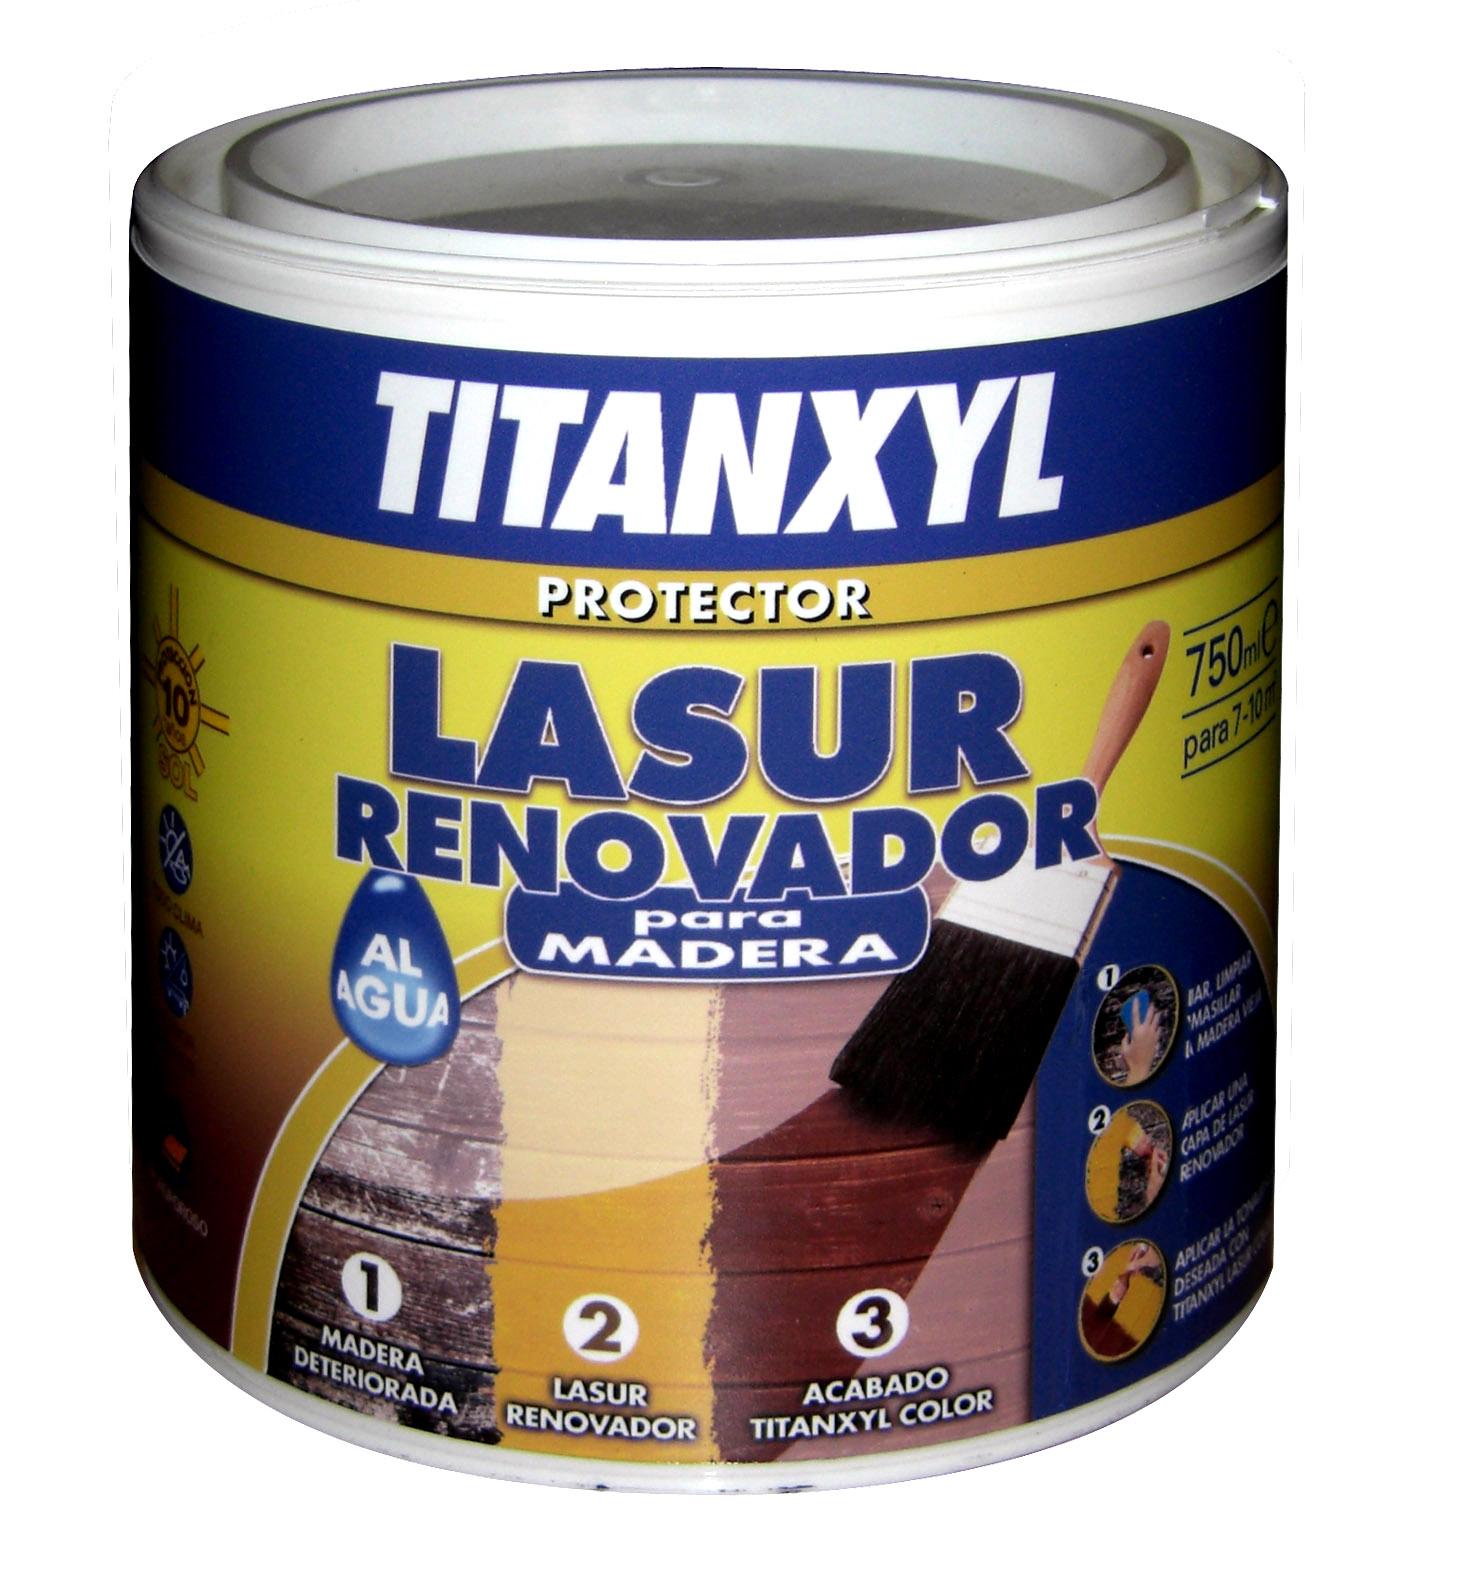 TITANXYL LASUR RENOVADOR AL AGUA